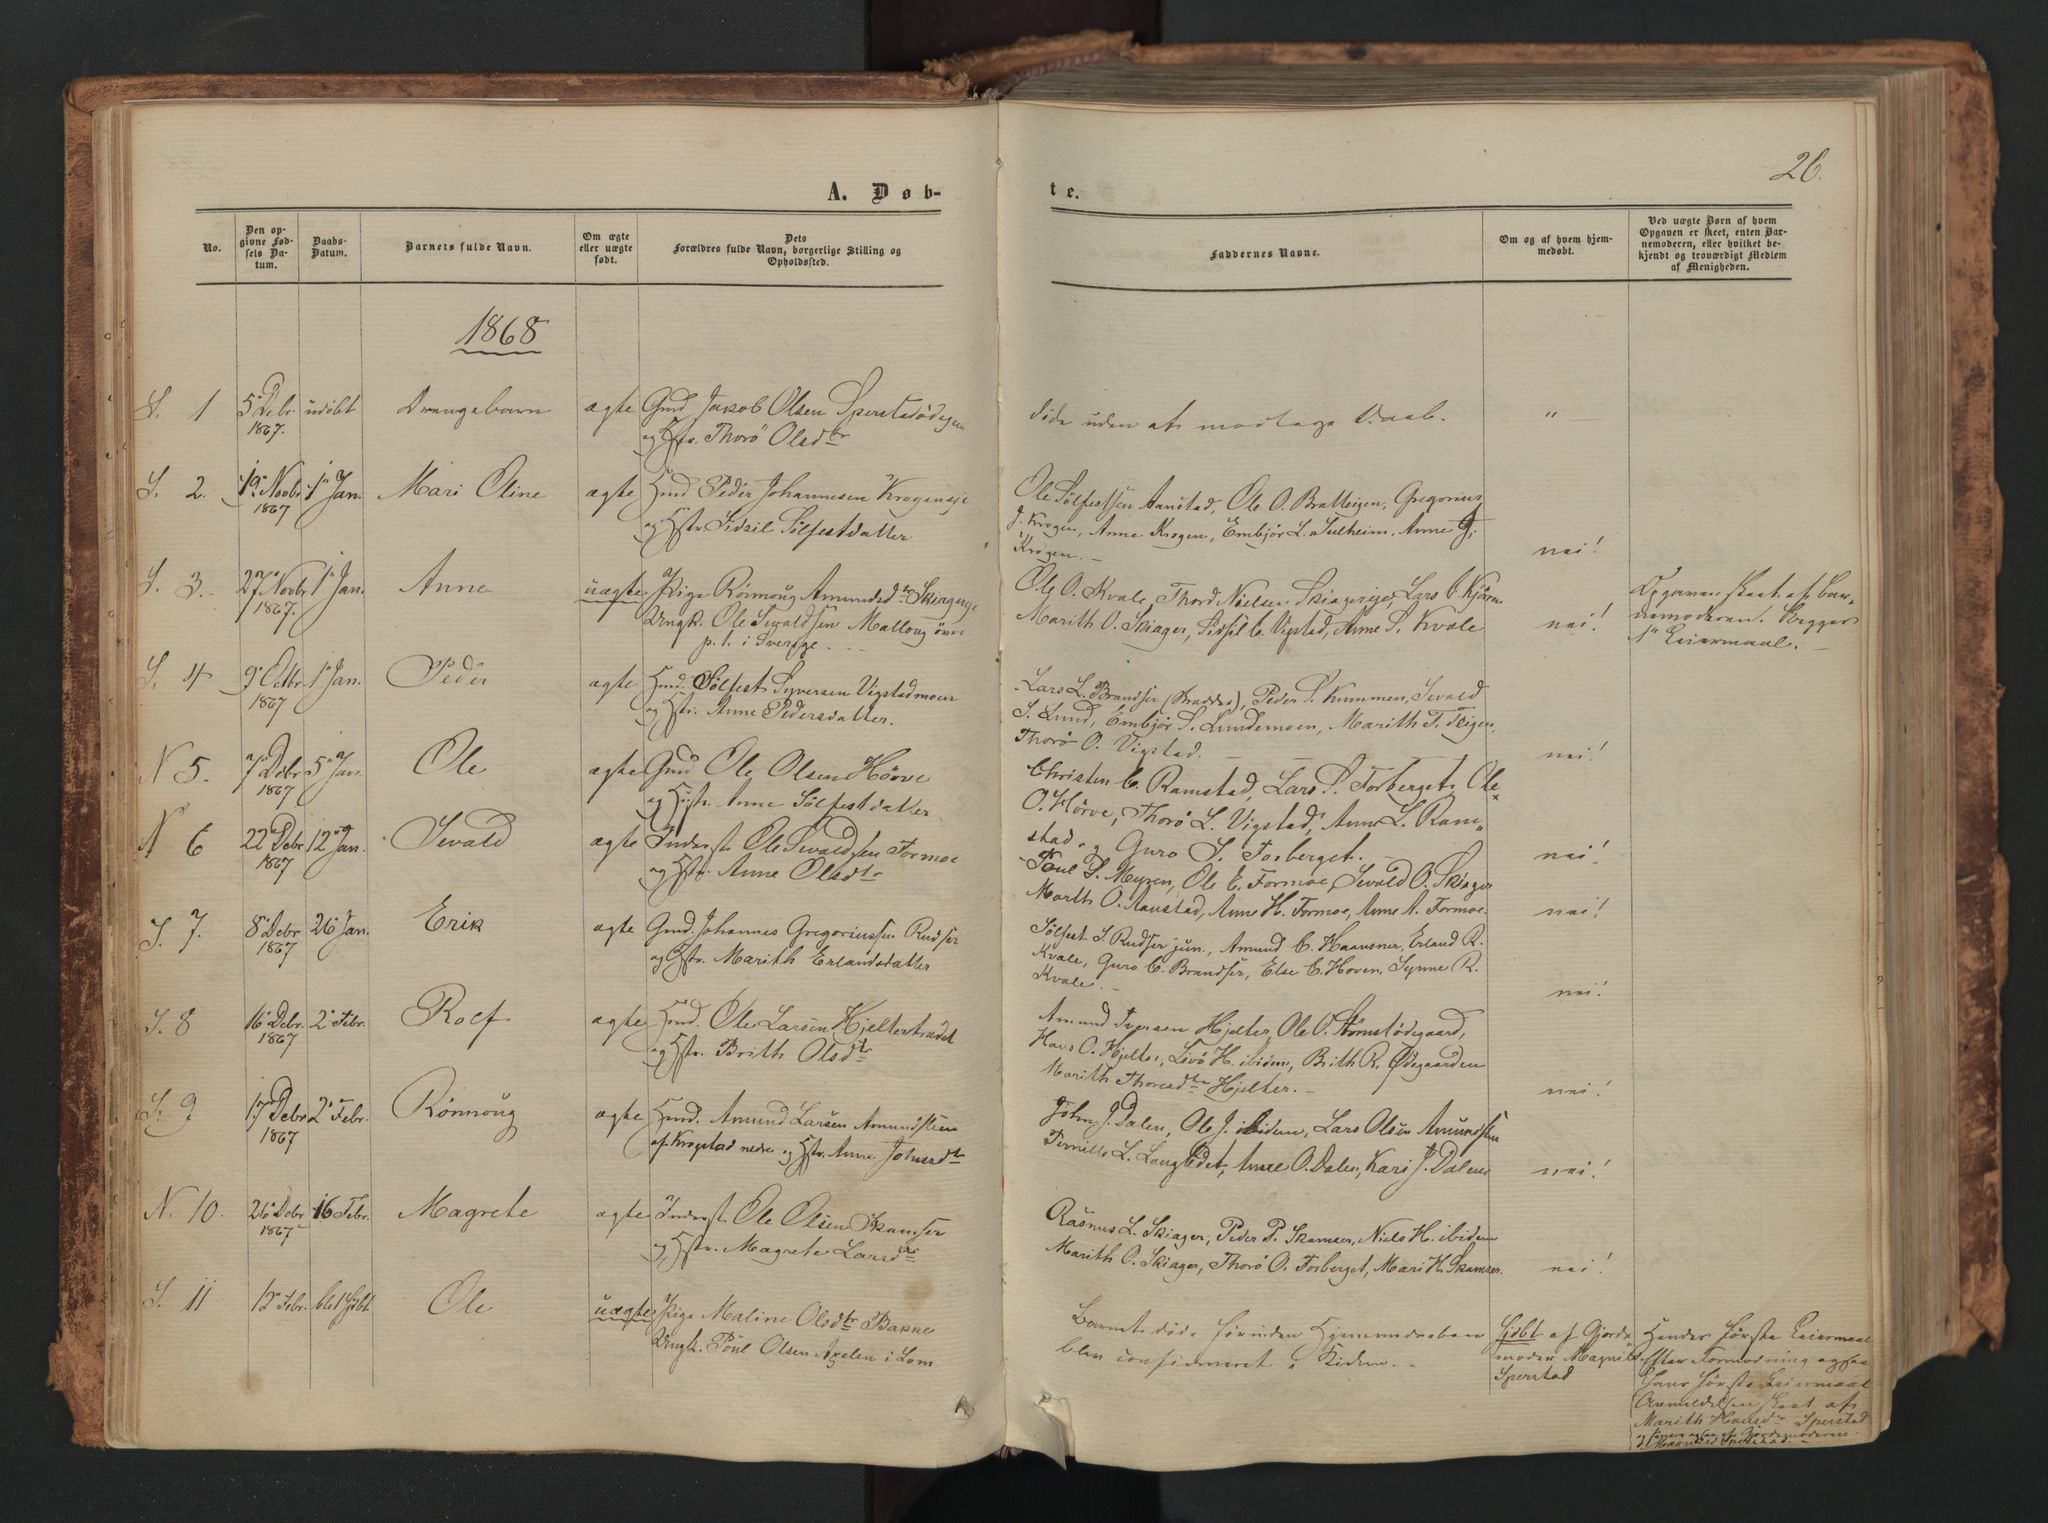 SAH, Skjåk prestekontor, Ministerialbok nr. 1, 1863-1879, s. 26